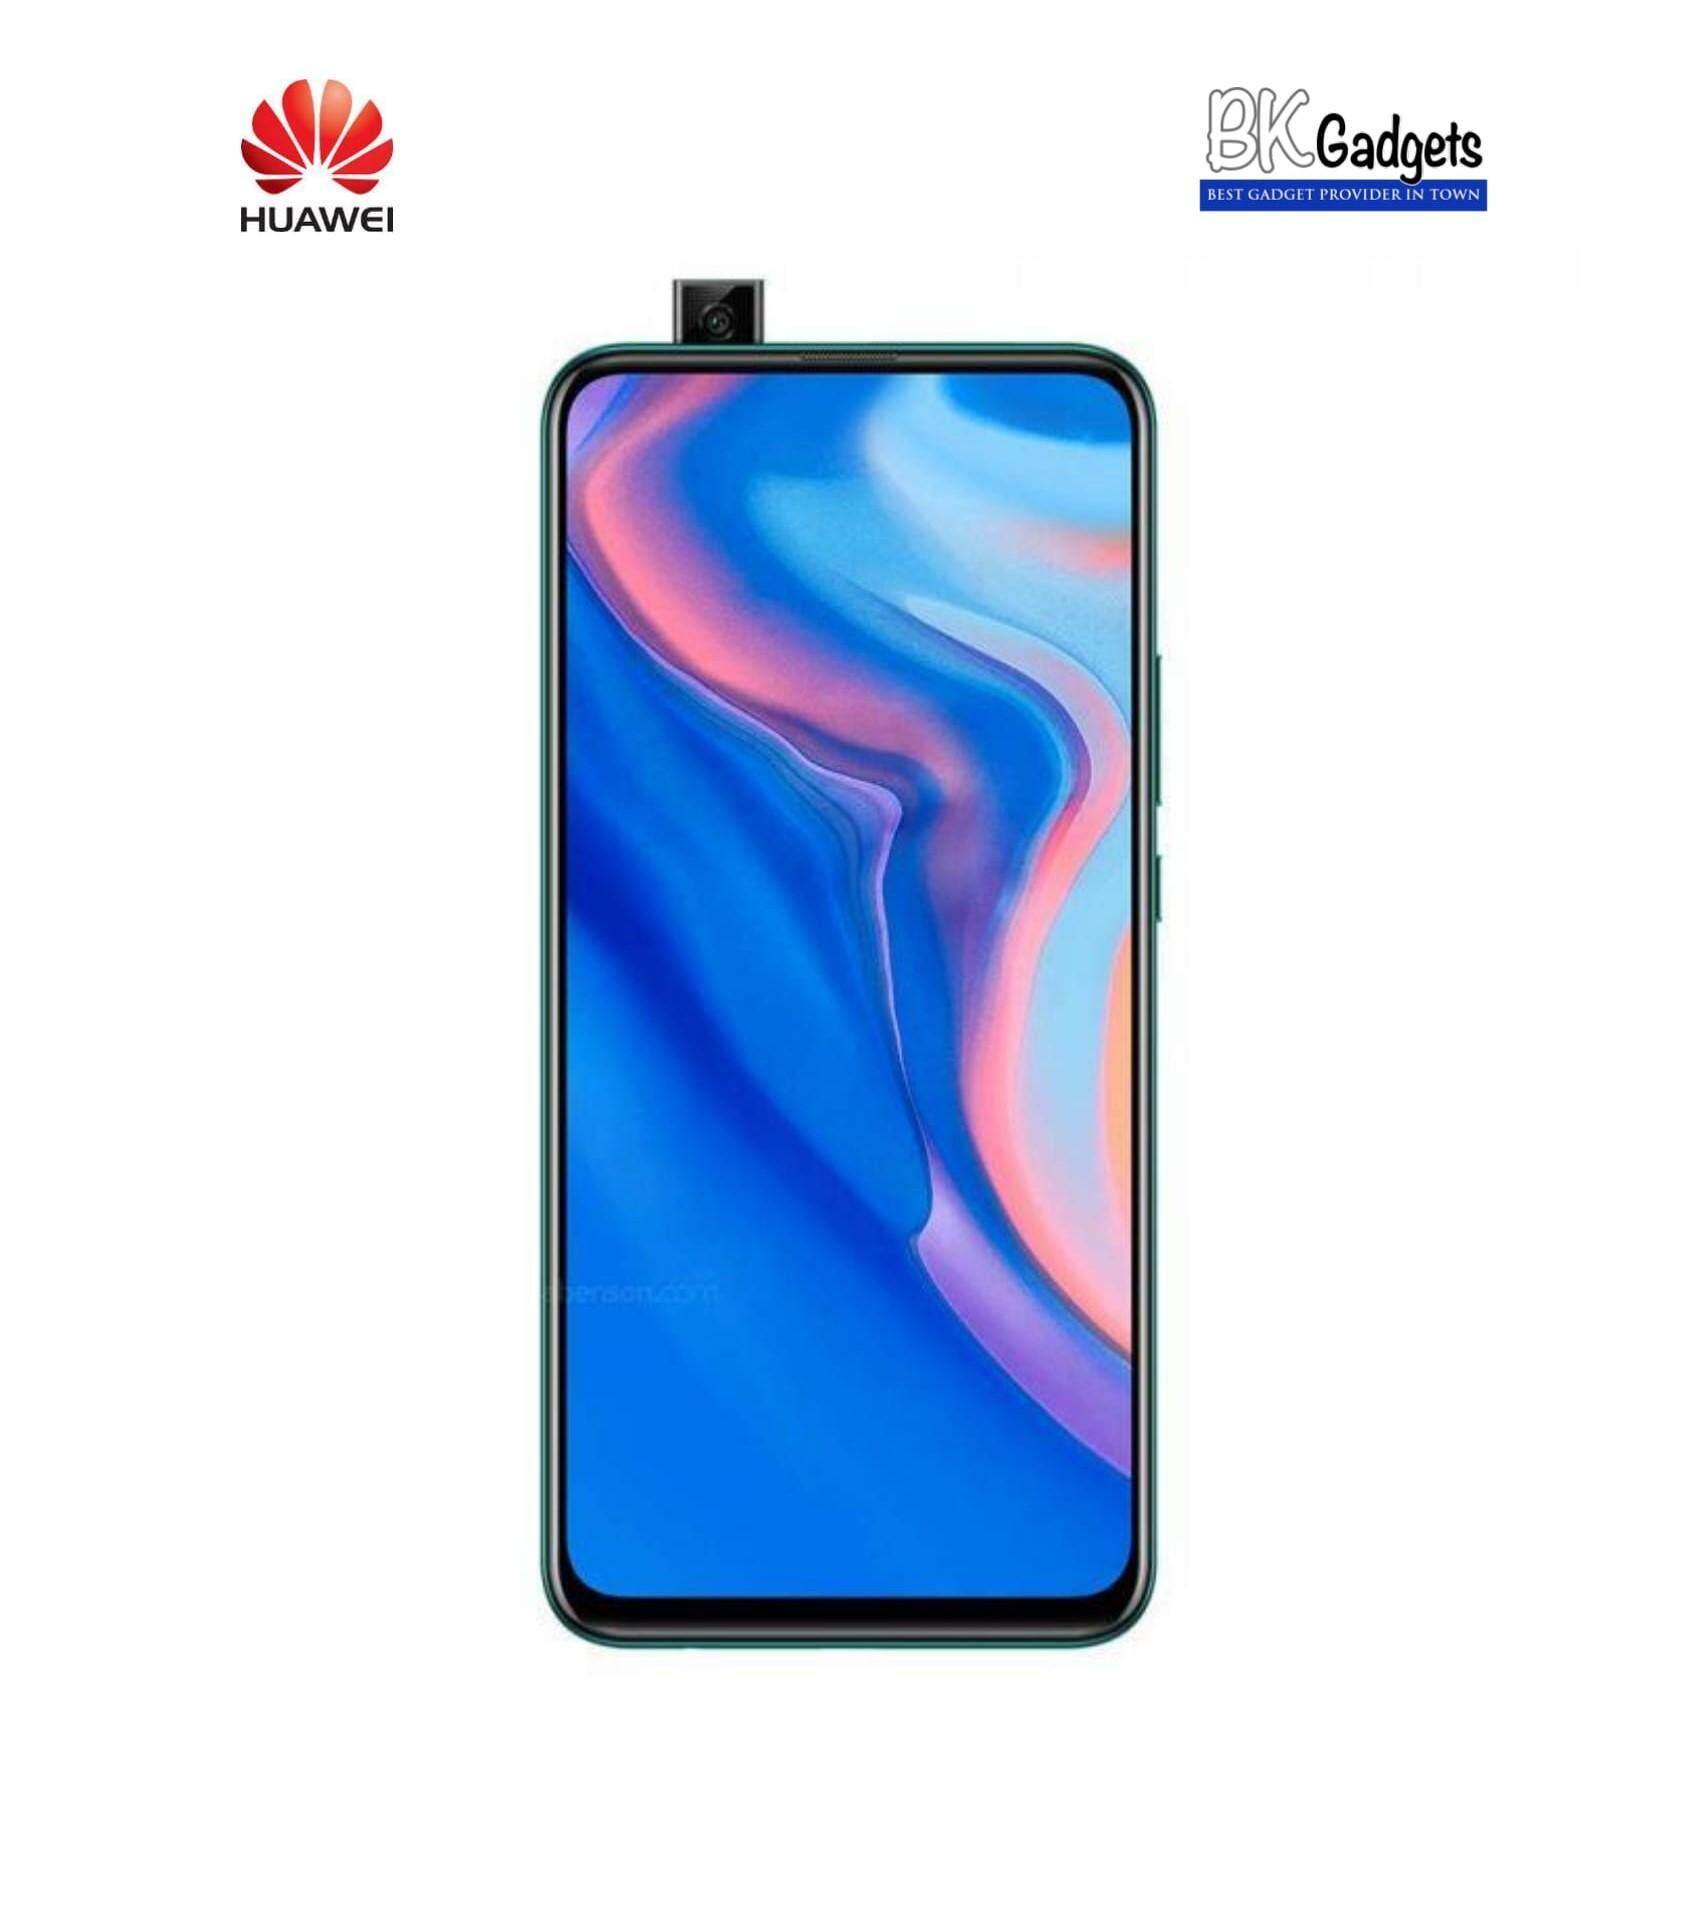 Huawei Y9 Prime 2019 4/128GB Emerald Green- Original from Huawei Malaysia 1 Year Warranty